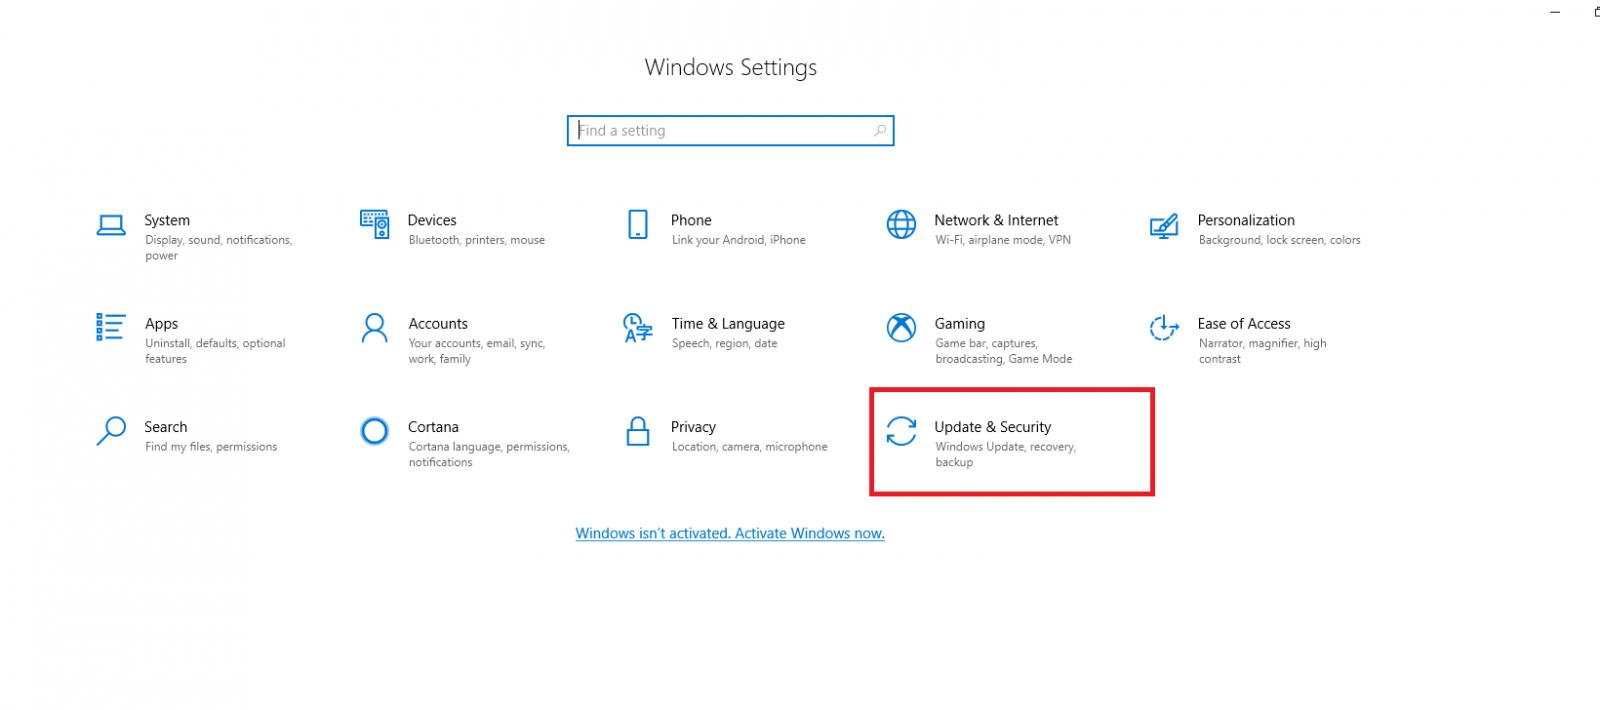 Backup Windows using File History